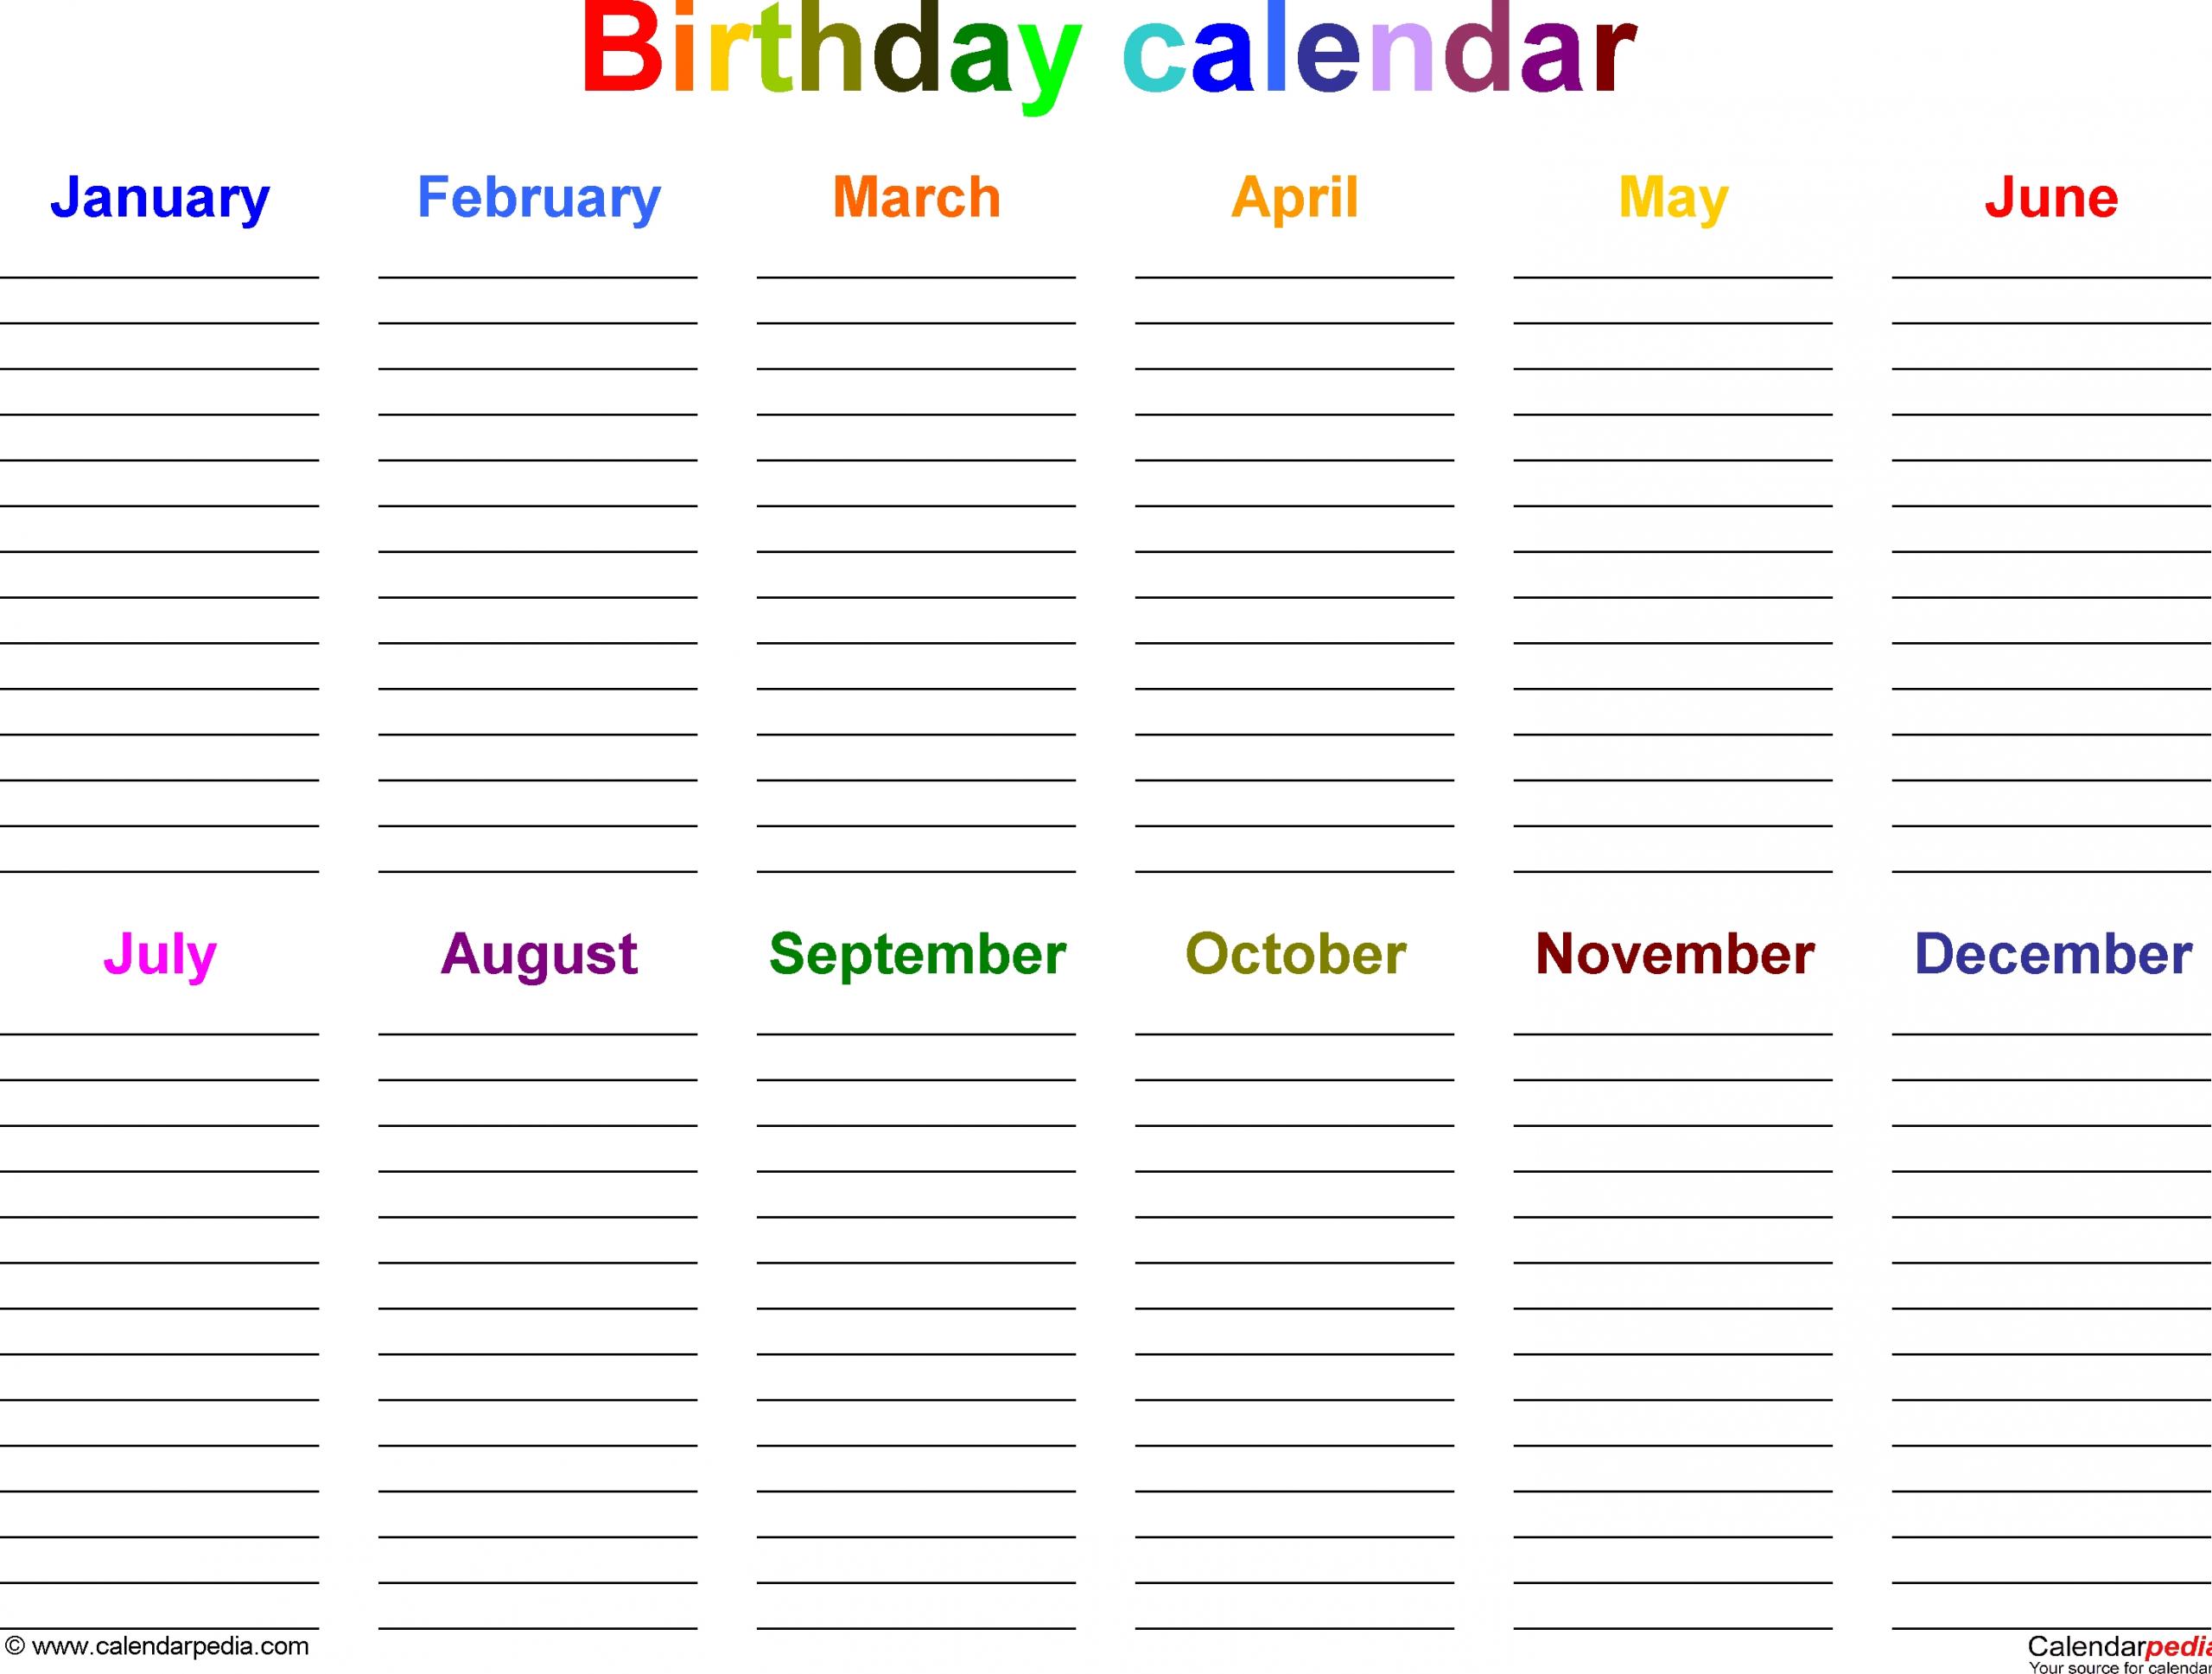 birthday calendars 7 free printable excel templates